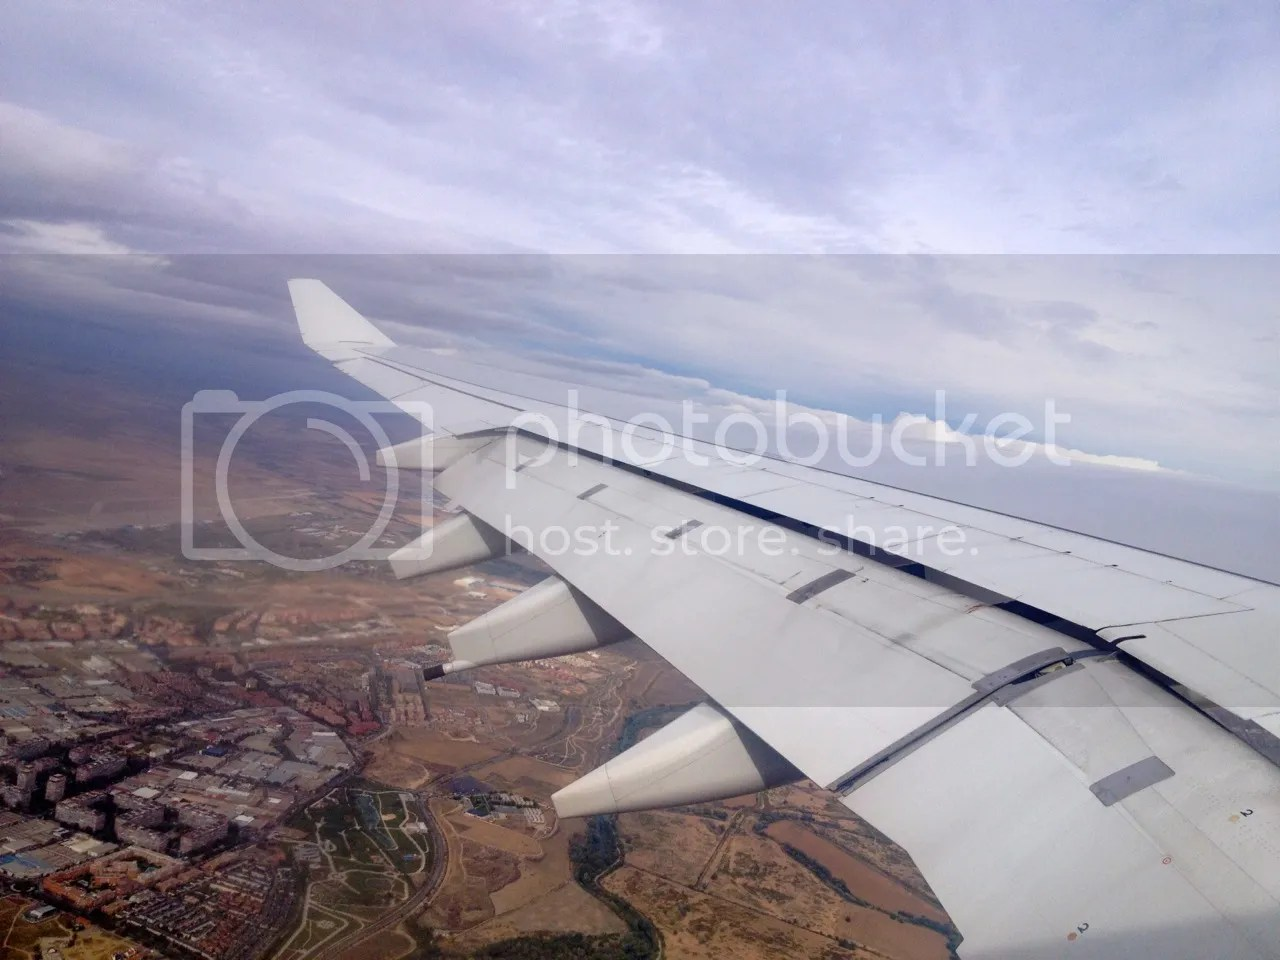 https://i2.wp.com/i181.photobucket.com/albums/x35/jwhite9185/Madrid/file-195.jpg